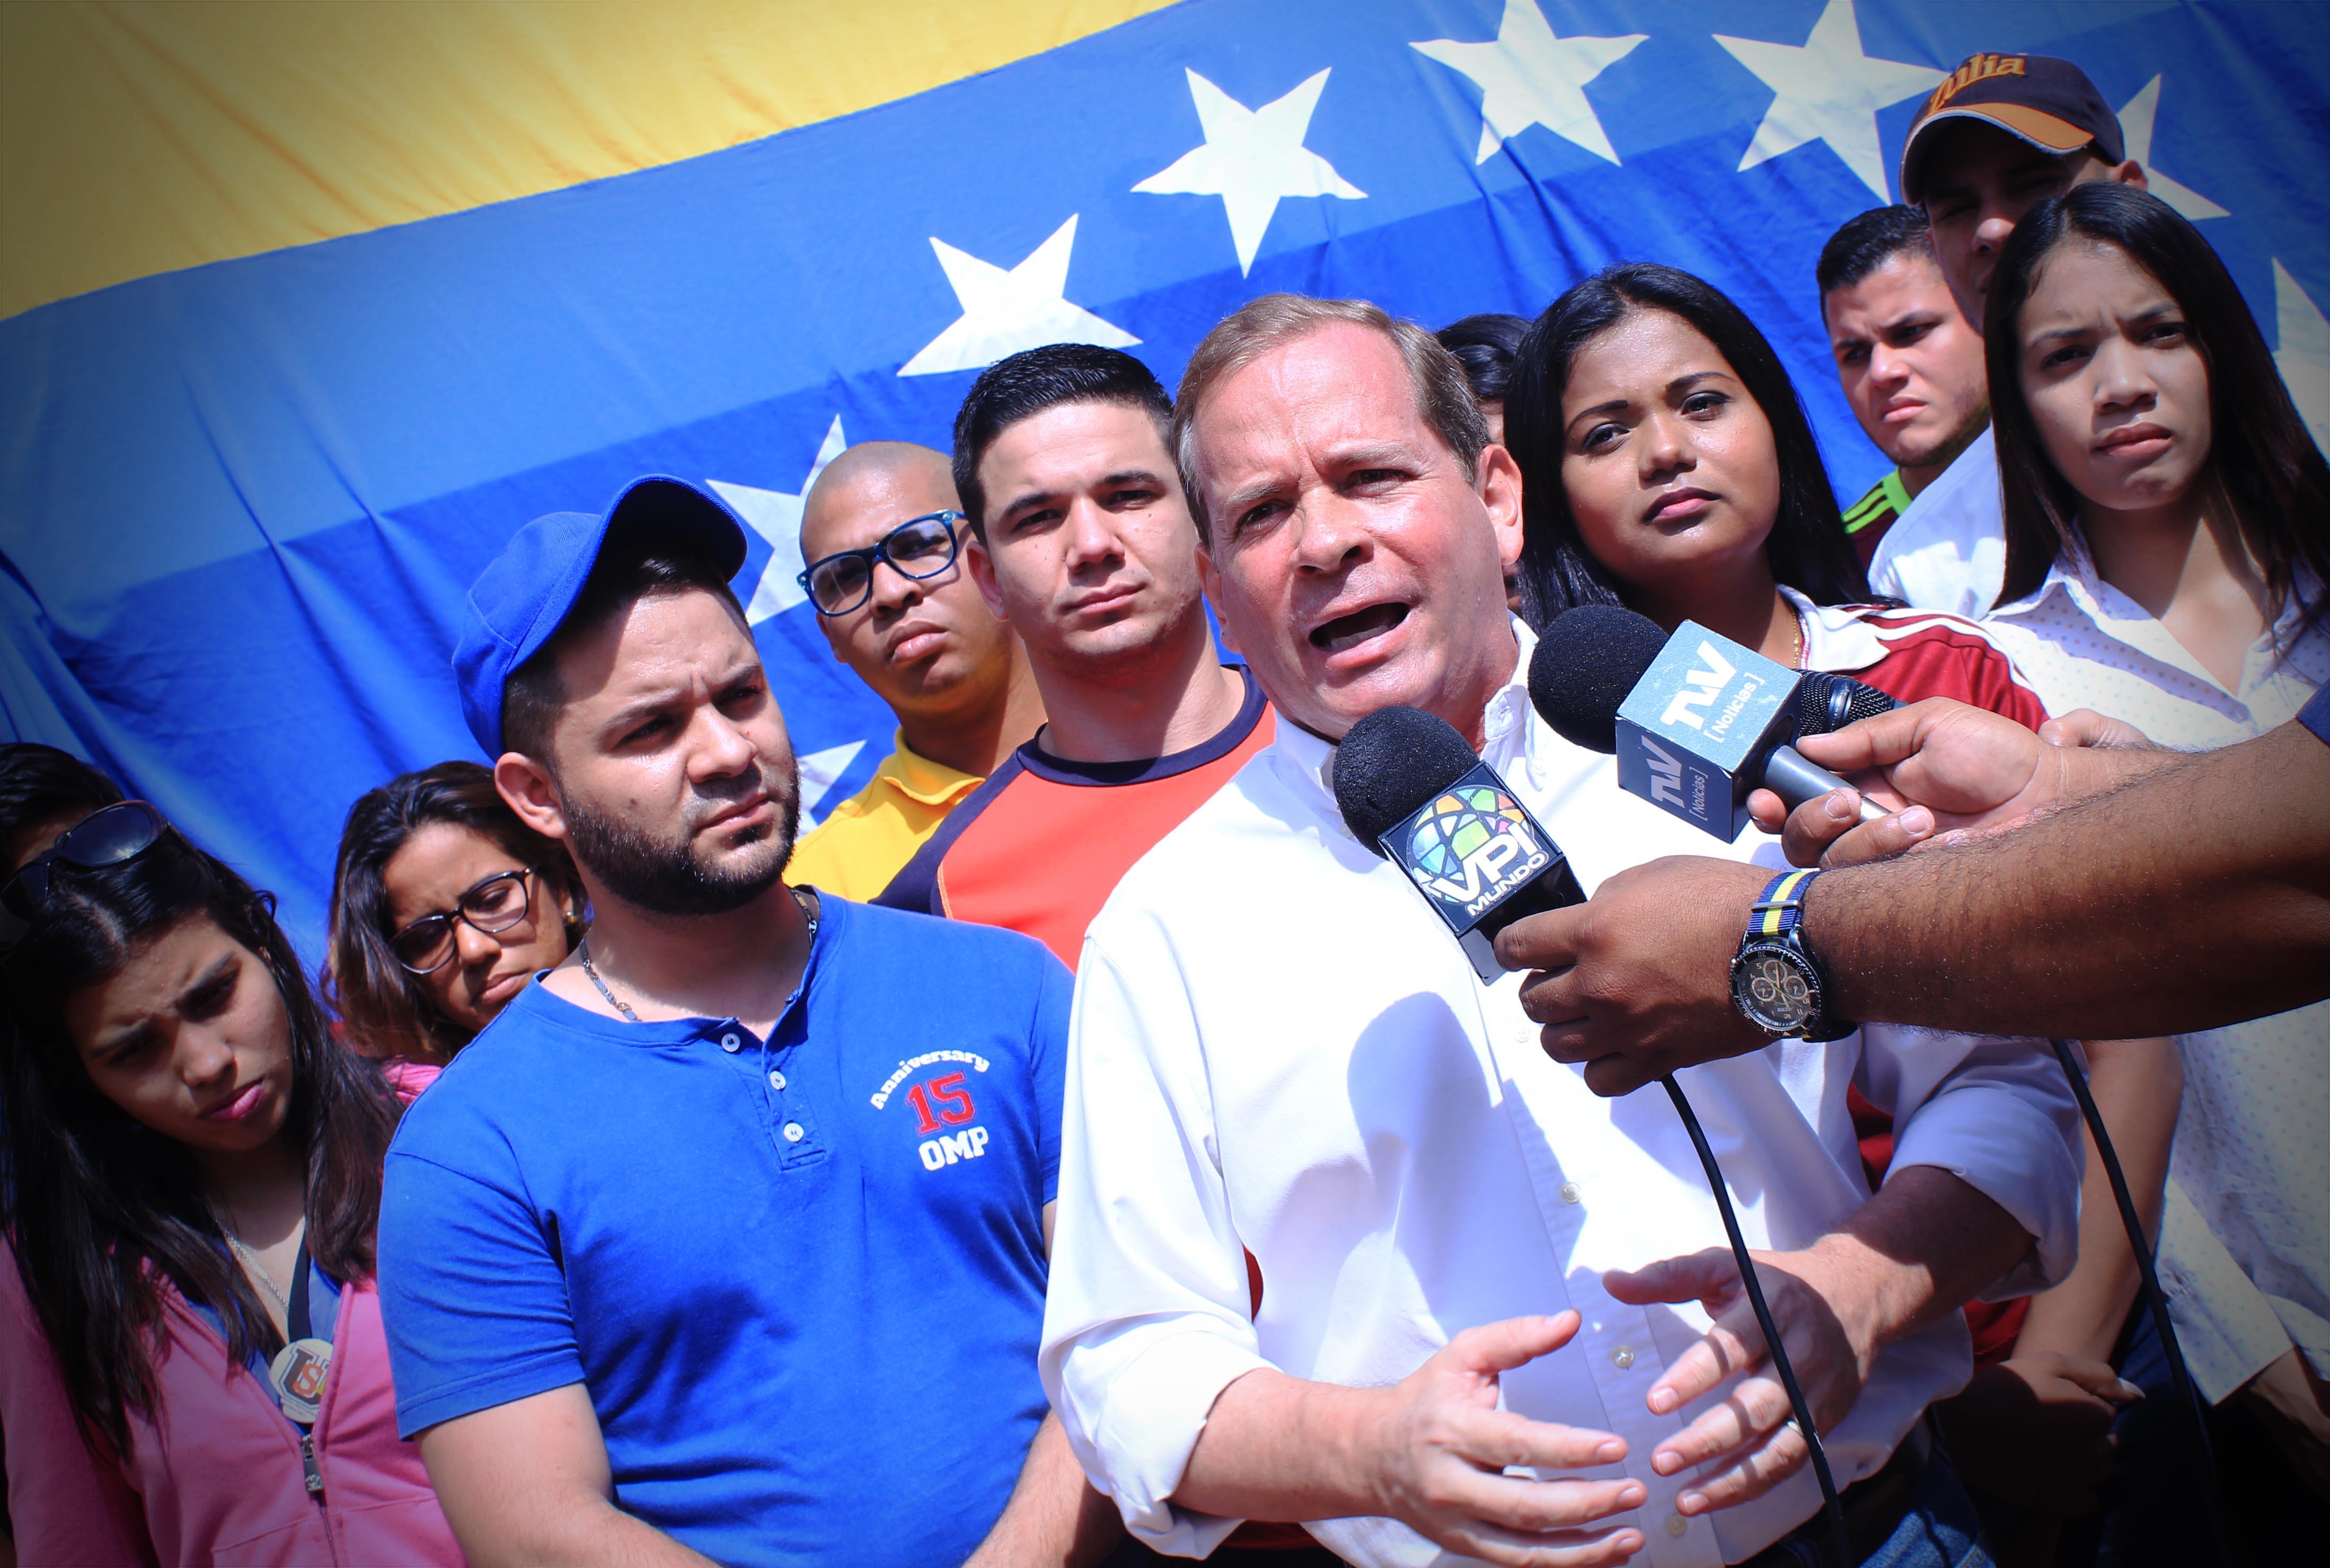 ANC cubana decidió atentar arbitrariamente contra inmunidad parlamentaria de Juan Pablo Guanipa